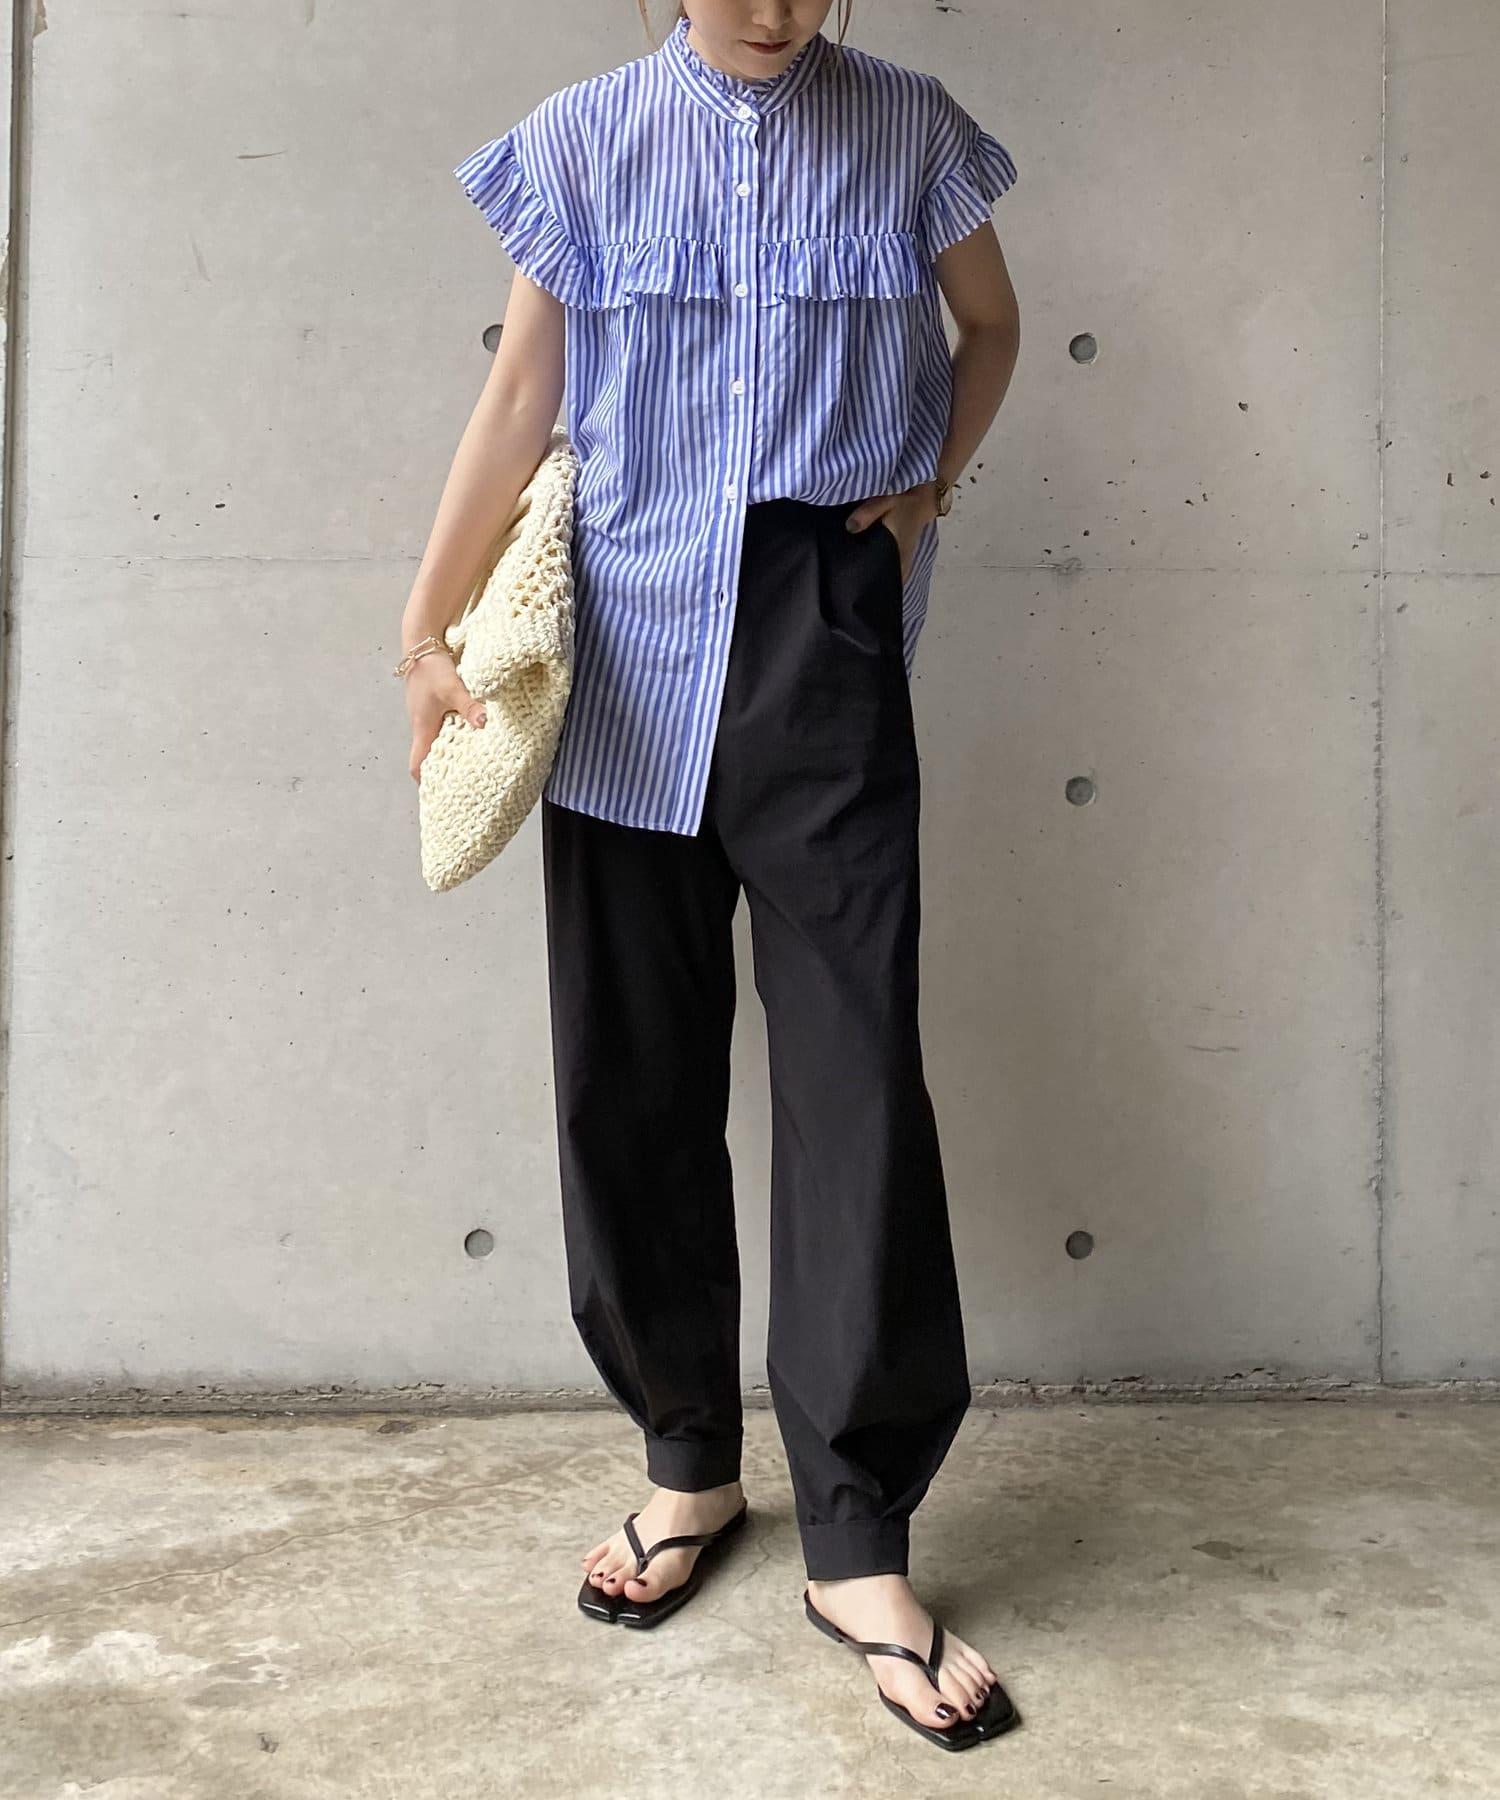 CAPRICIEUX LE'MAGE(カプリシュレマージュ) 裾タックジョガーパンツ